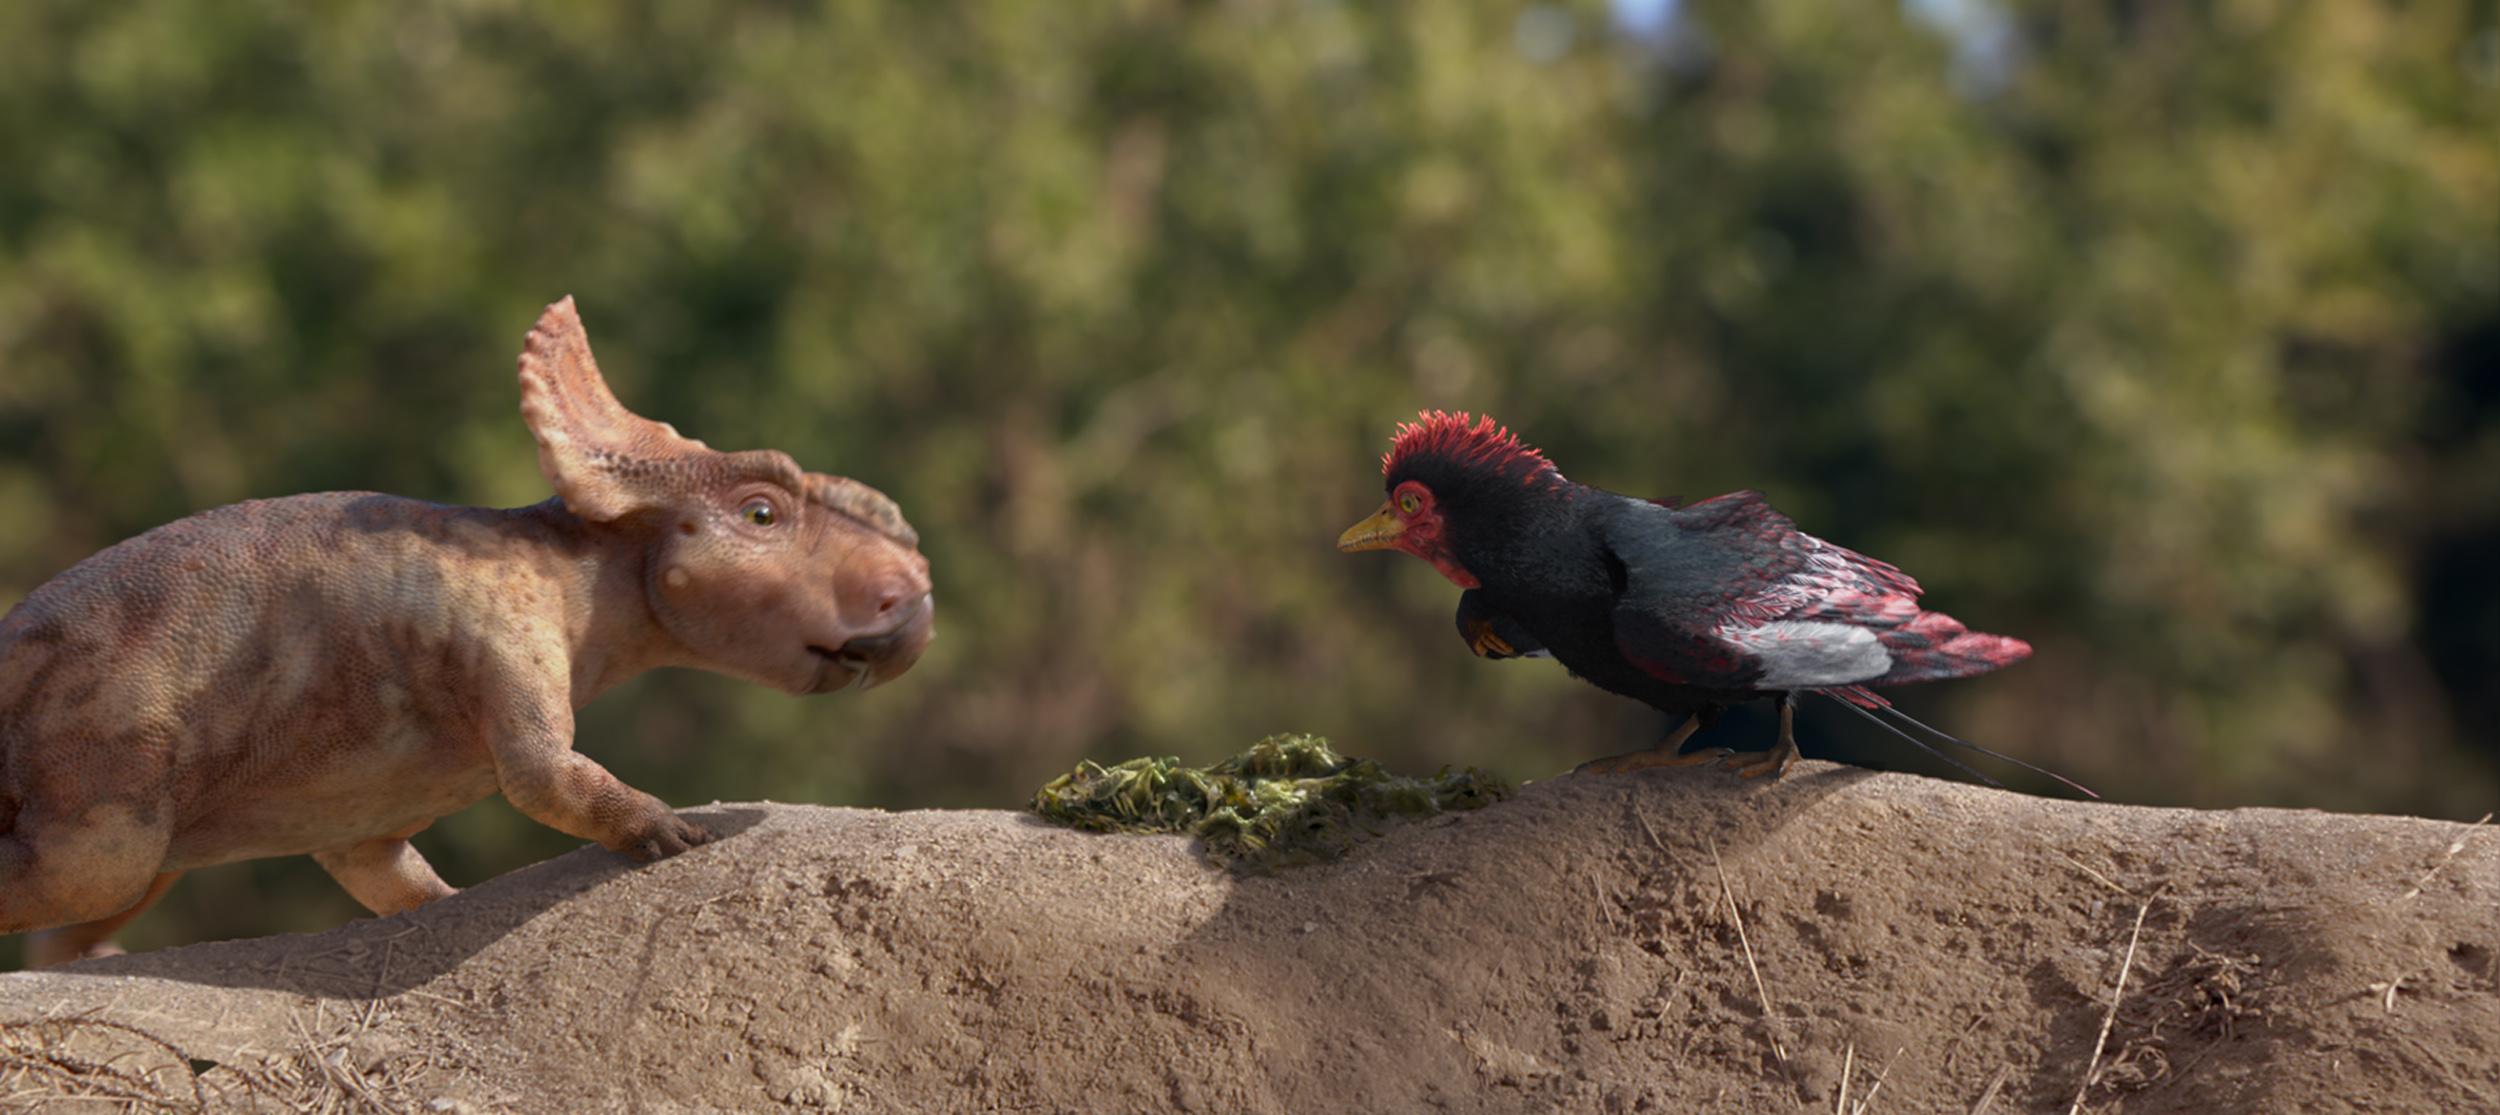 https://unasalahat.files.wordpress.com/2013/12/patchi-meet-alex-the-alexornis-bird-narrator-in-walking-with-dinosaurs_.jpg Walking